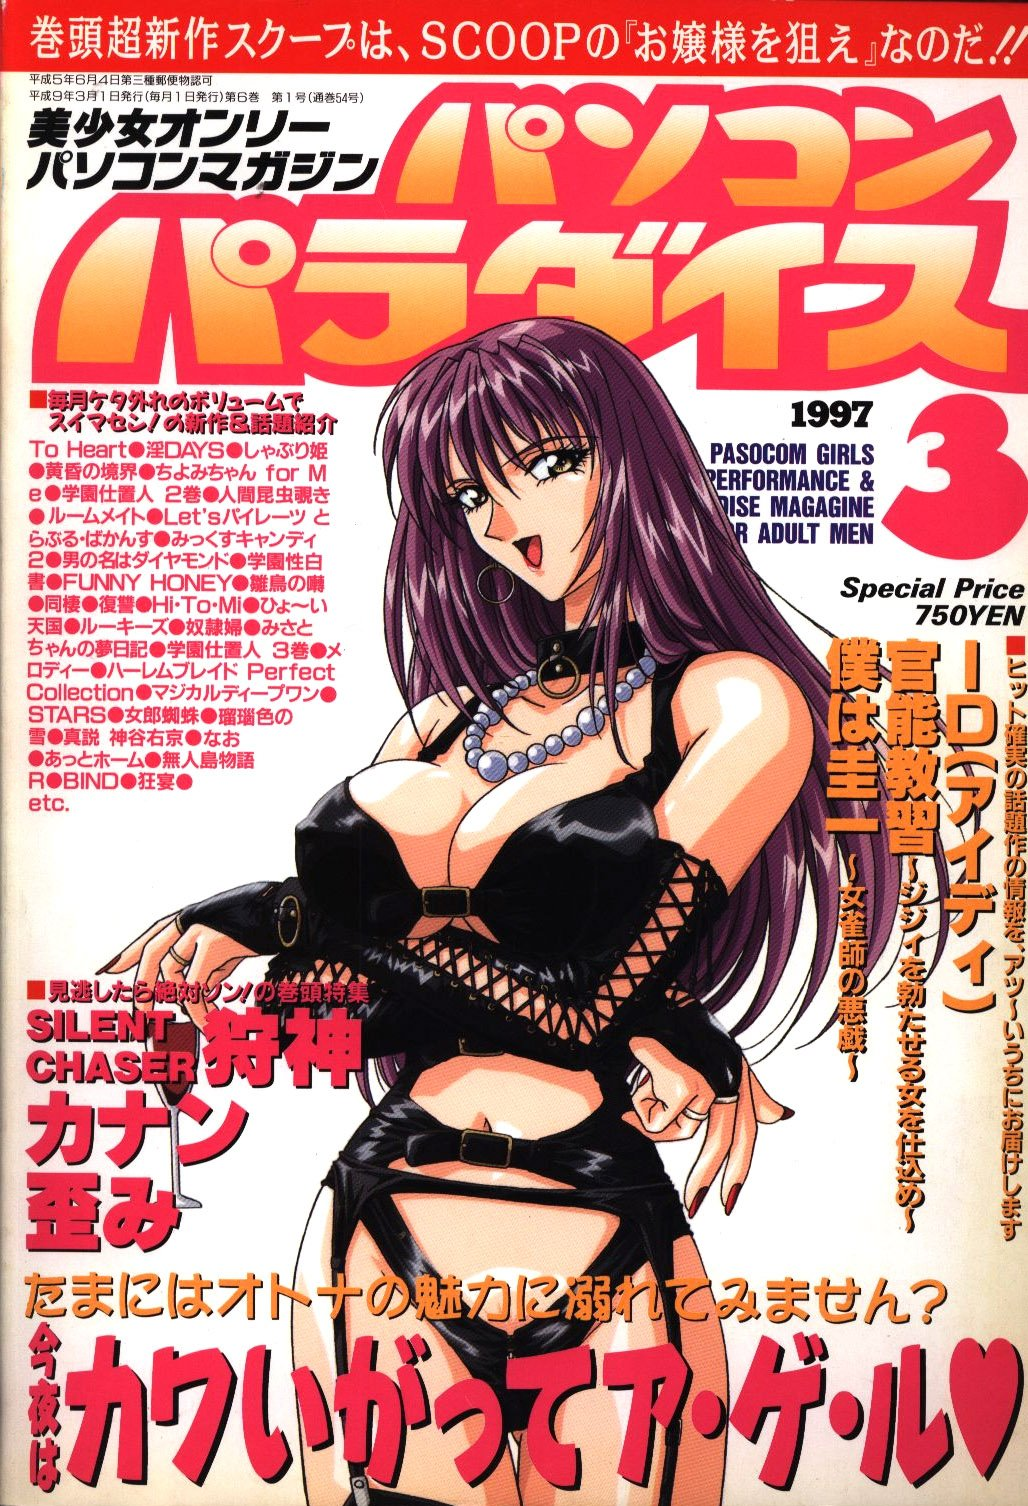 Pasocom Paradise Vol.058 (March 1997)